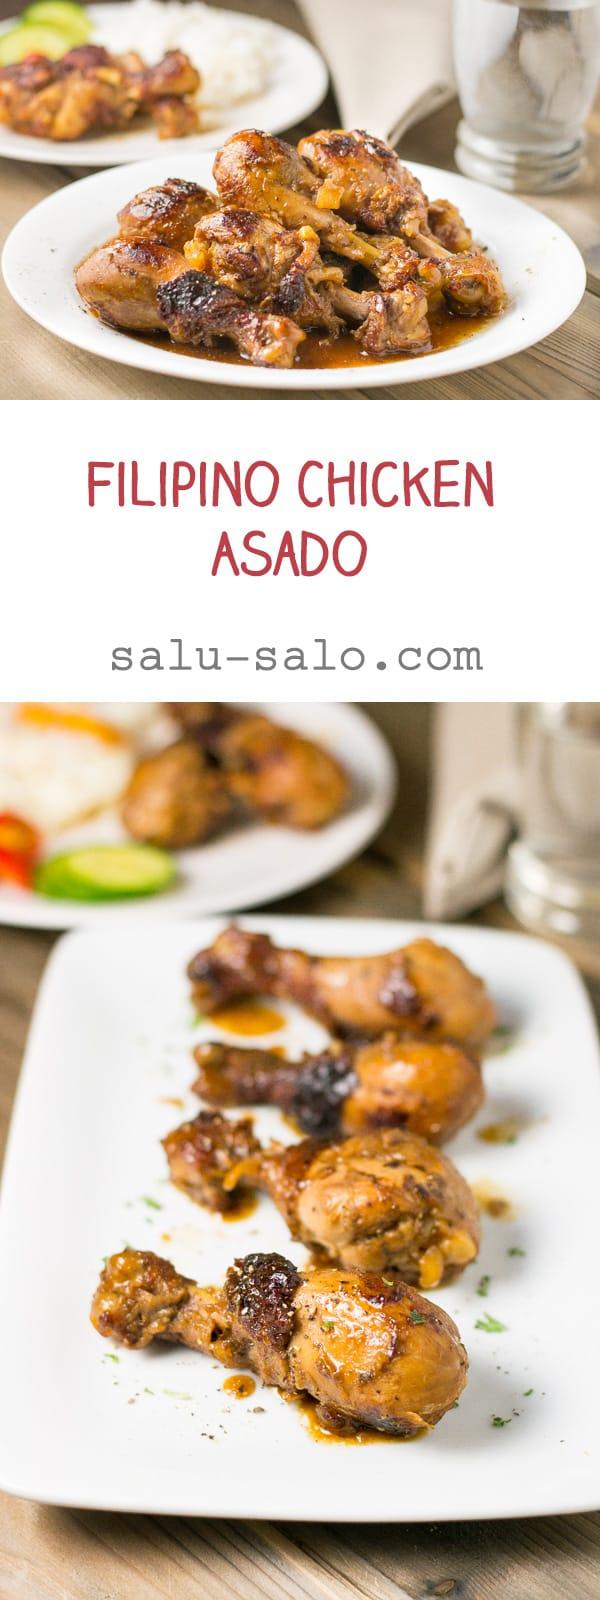 Filipino Chicken Asado